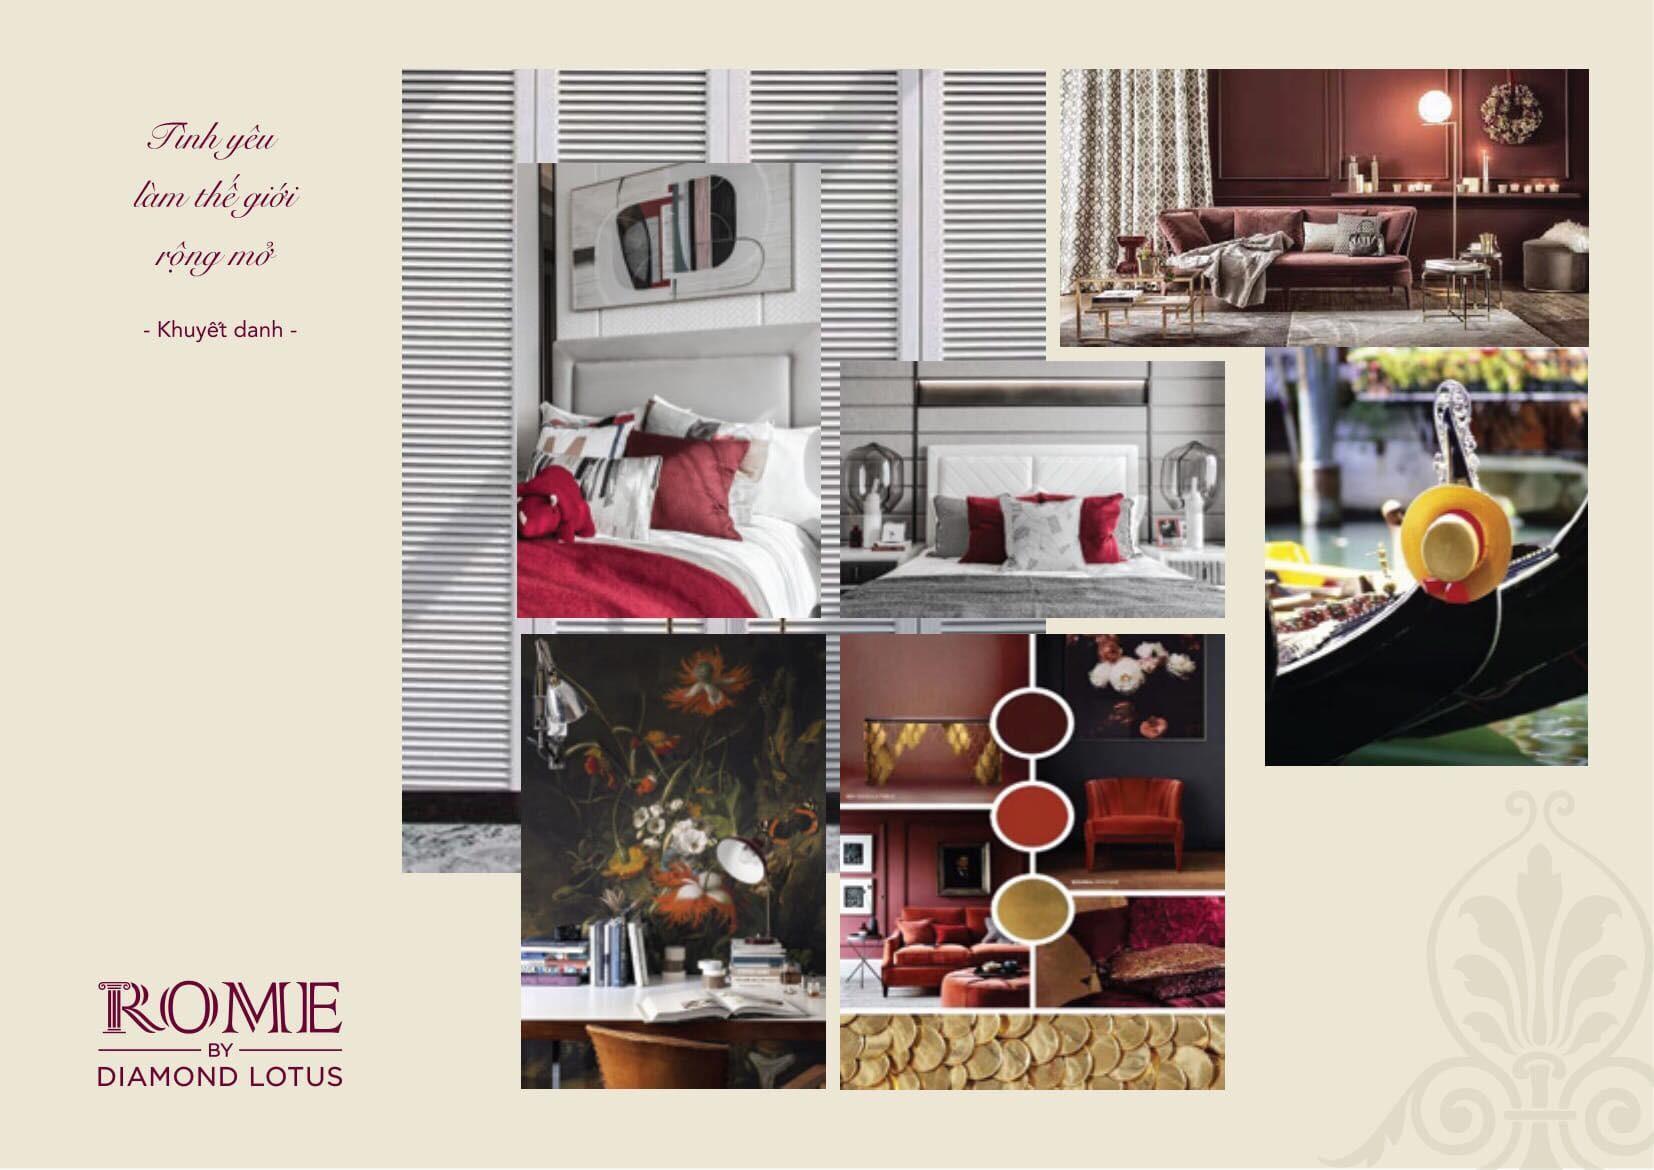 thiết kế căn hộ rome diamond lotus quận 2